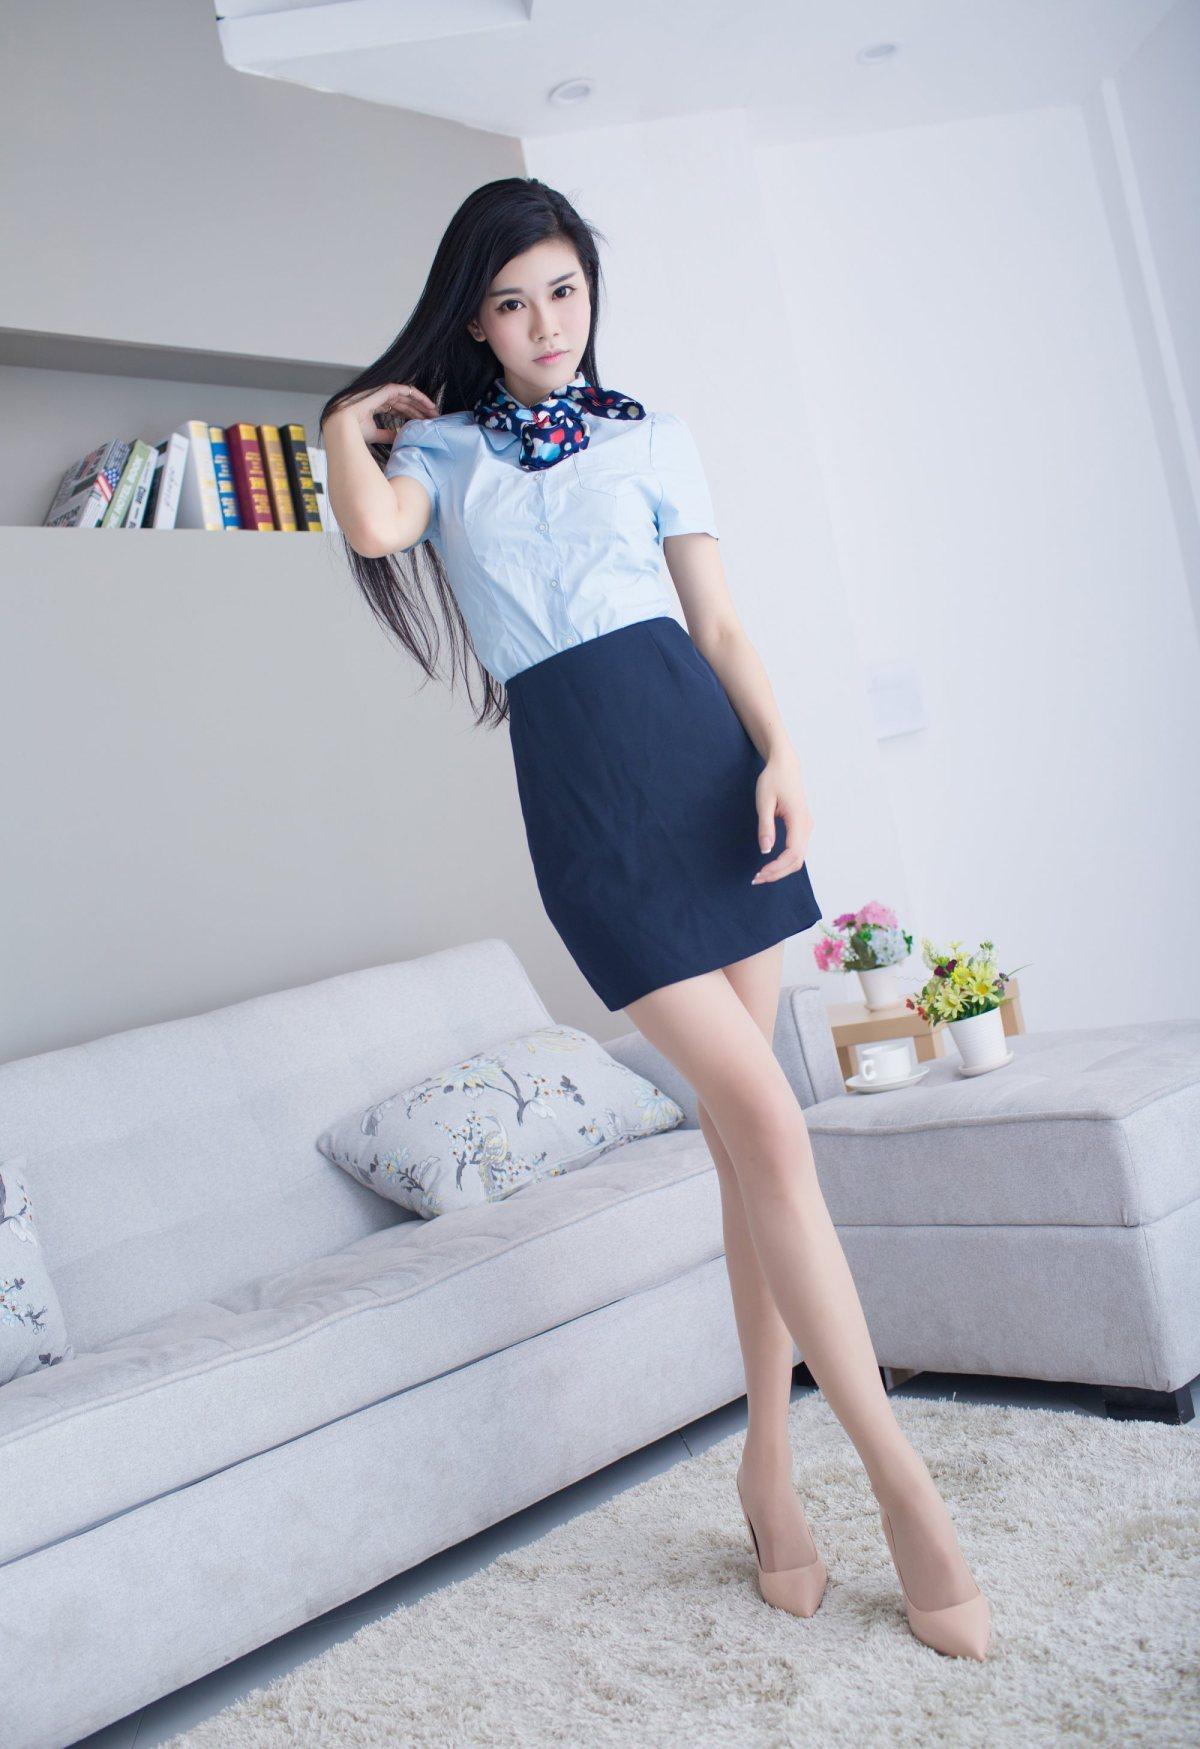 JCN-003超短裙性感圣诞女郎